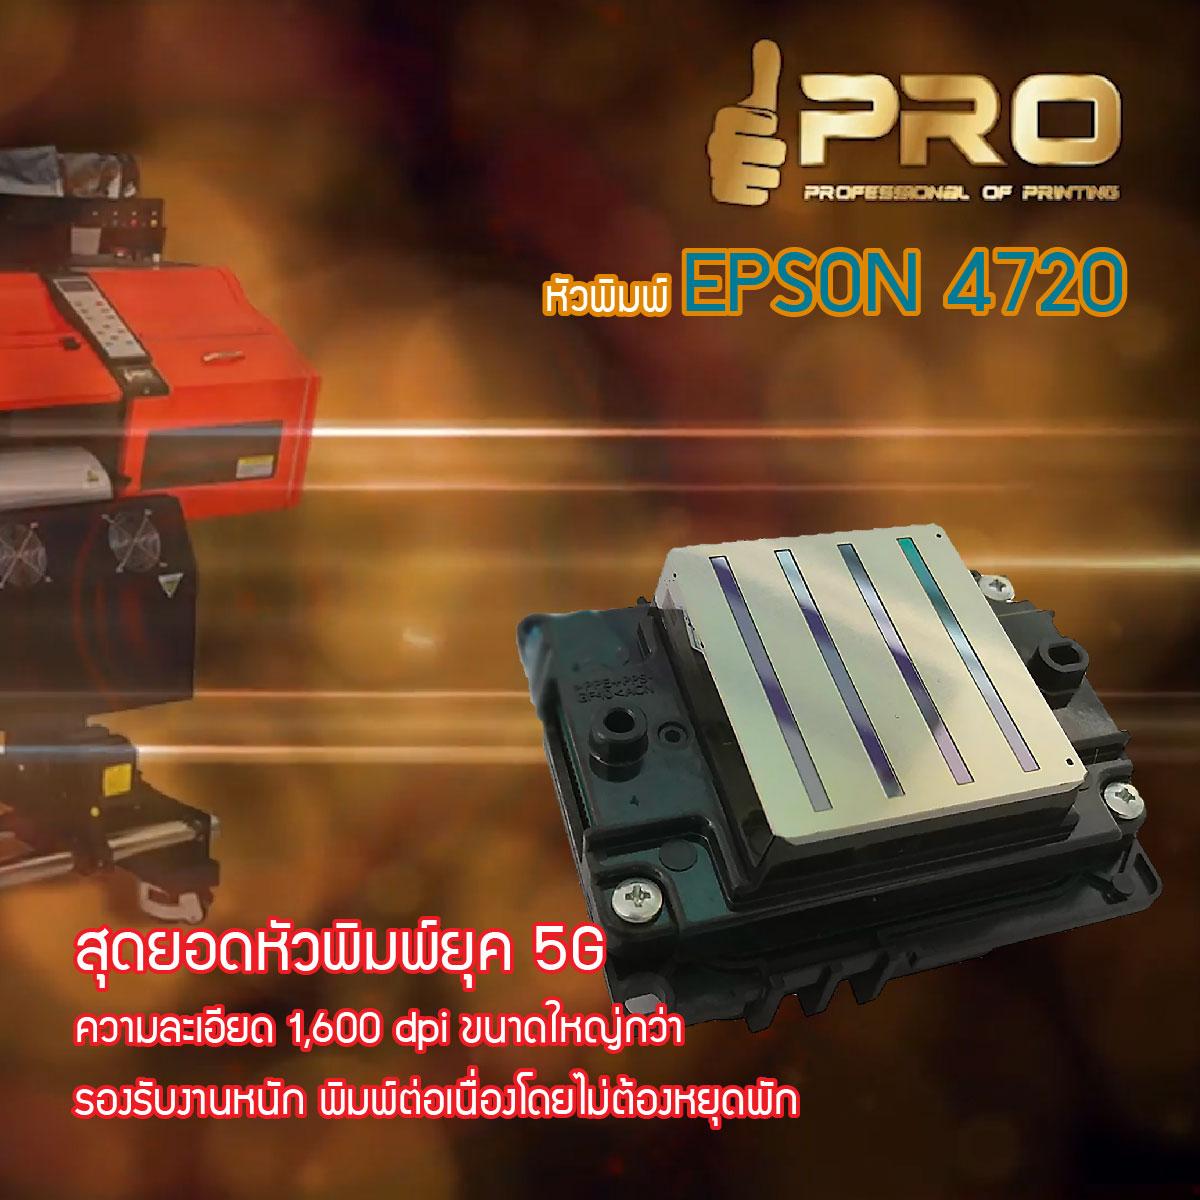 print head, หัวพิมพ์, เอปสัน, epson, 4720, pro printer, โปร ปริ้นเตอร์